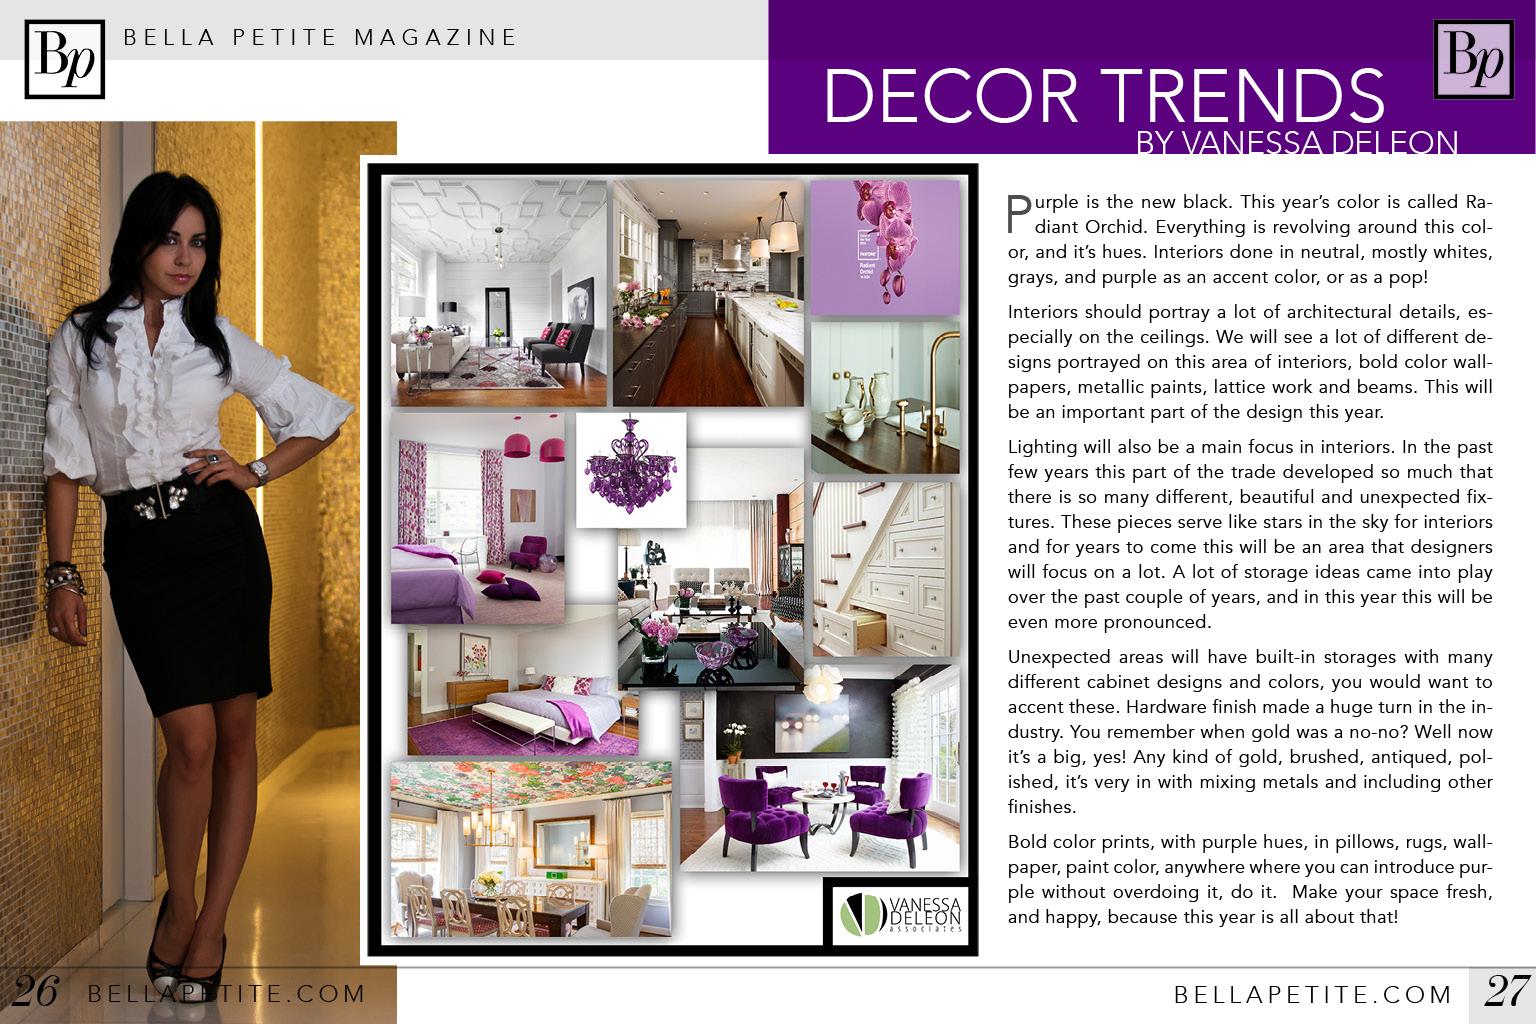 Bella Petite Models Magazine (no year)14